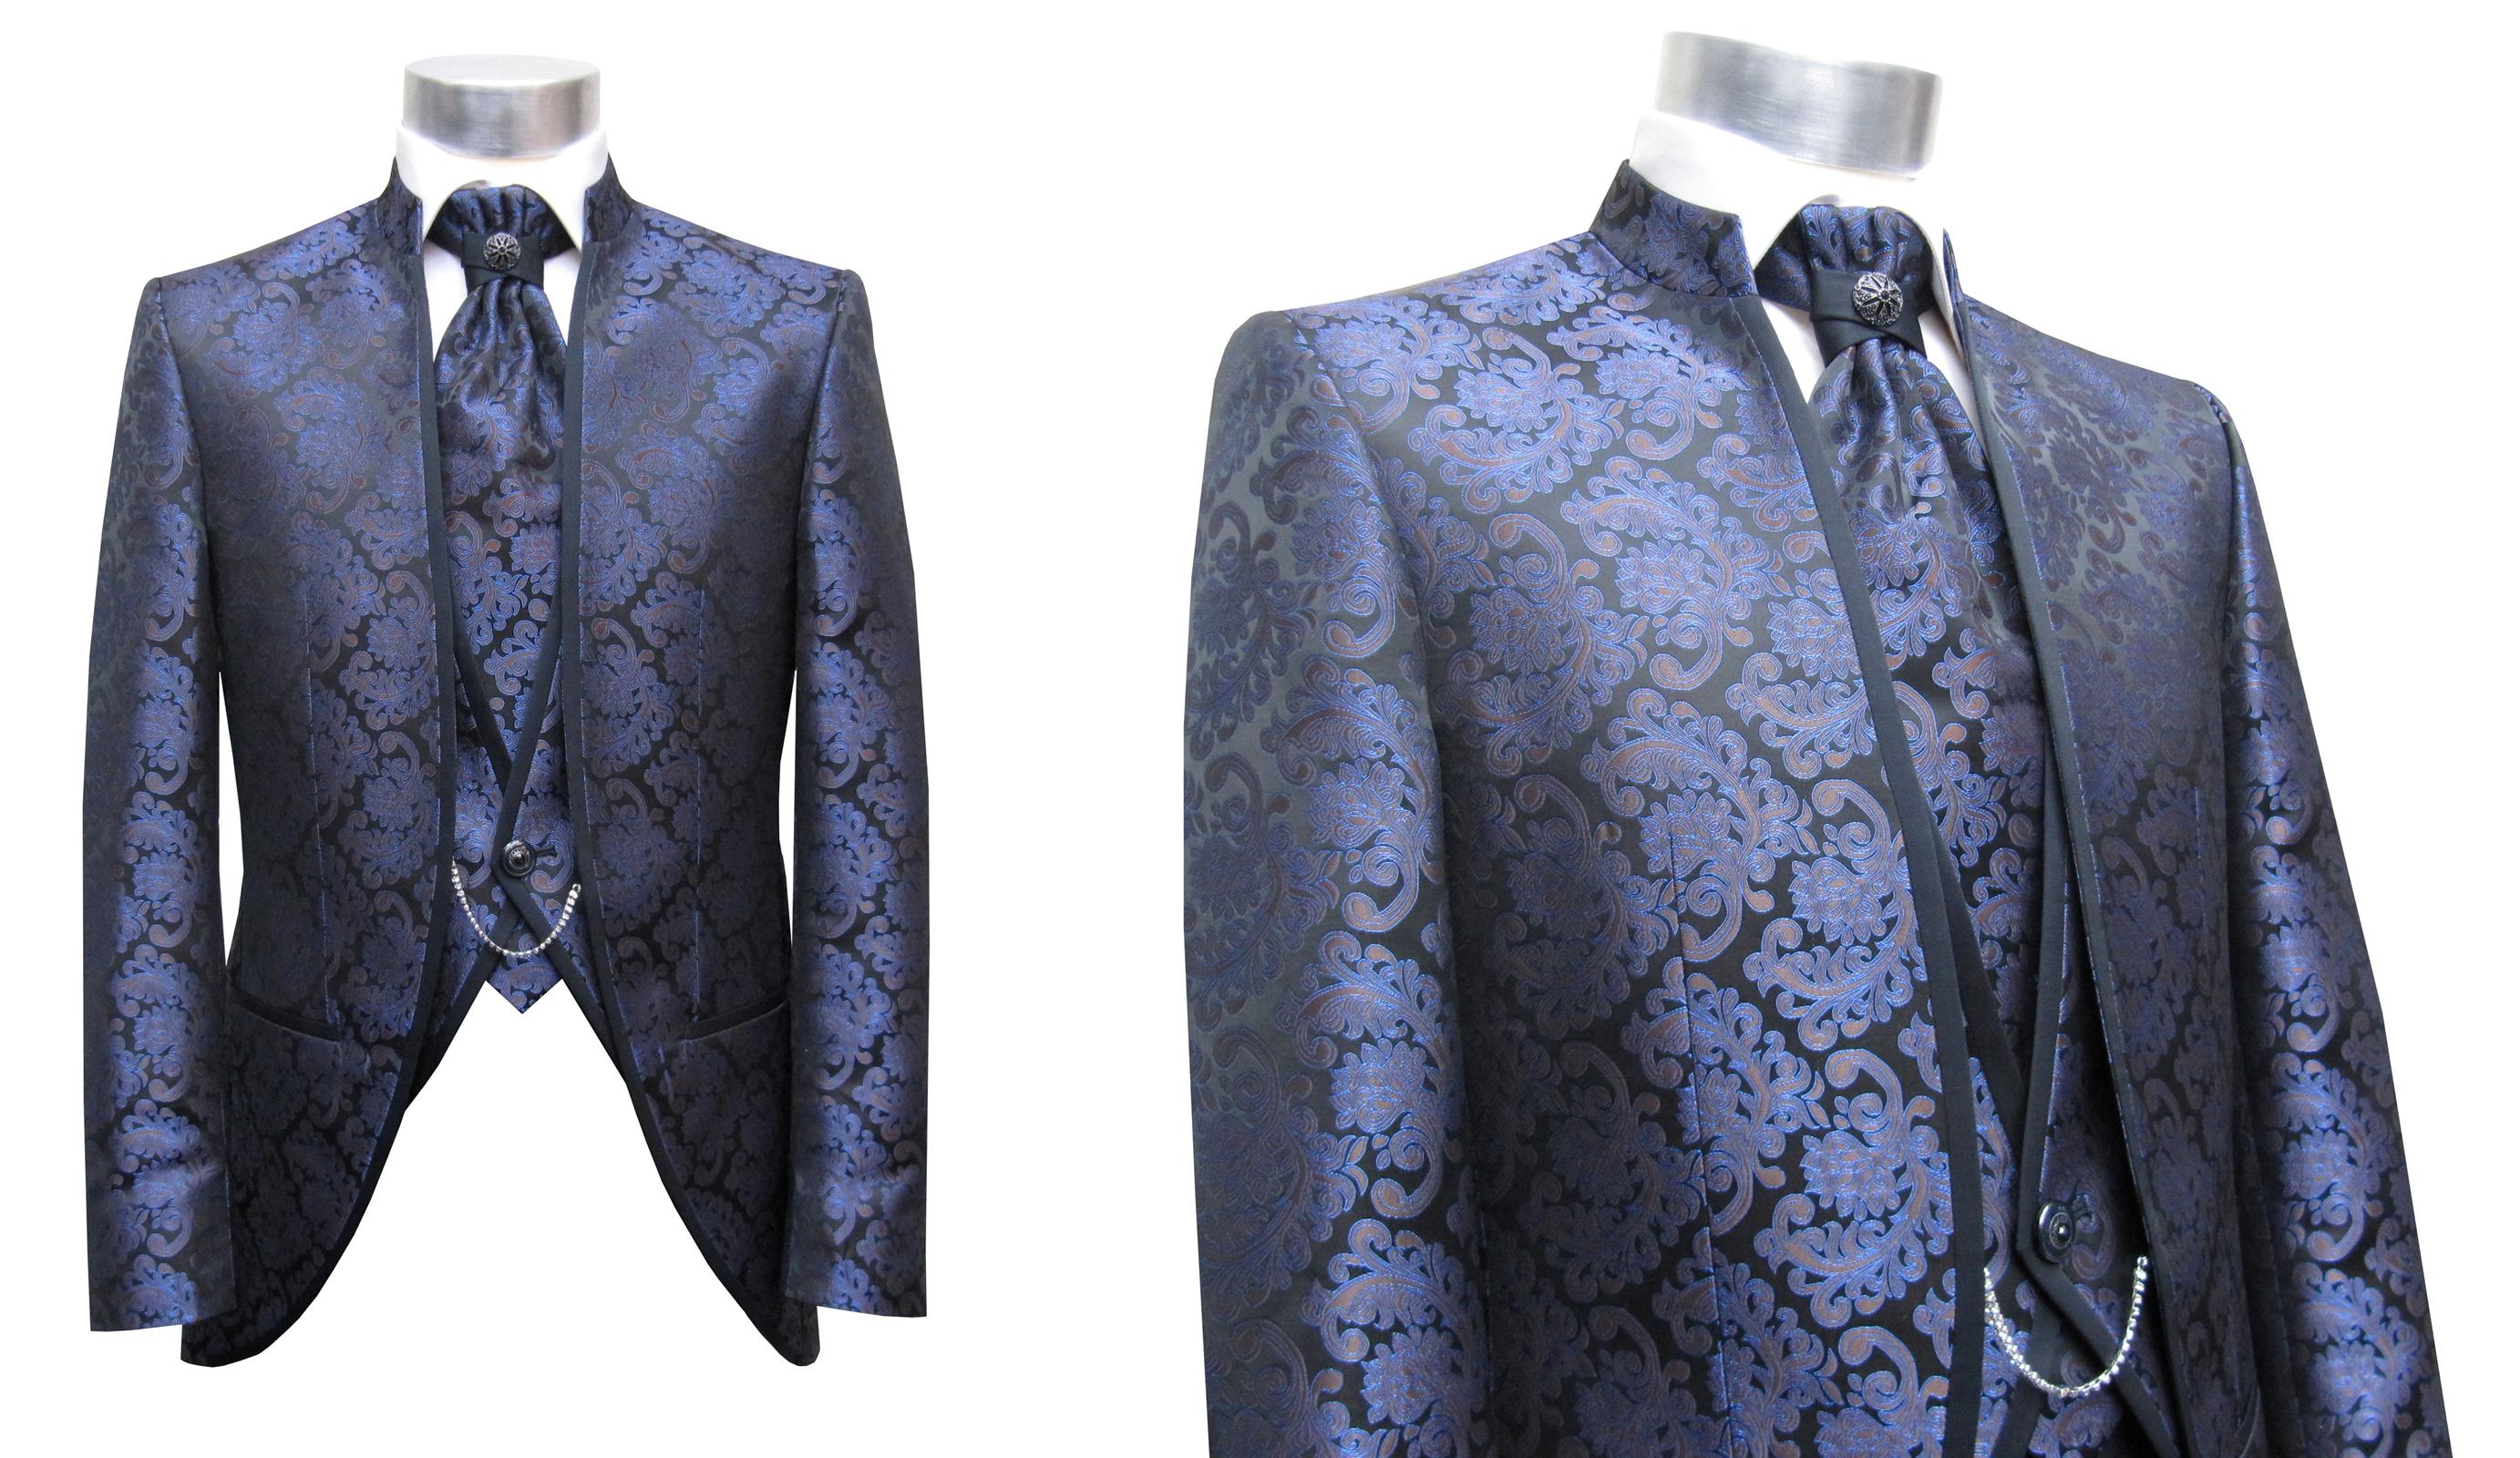 cutaway gehrock herren anzug 3 teilig blau lila ebay. Black Bedroom Furniture Sets. Home Design Ideas